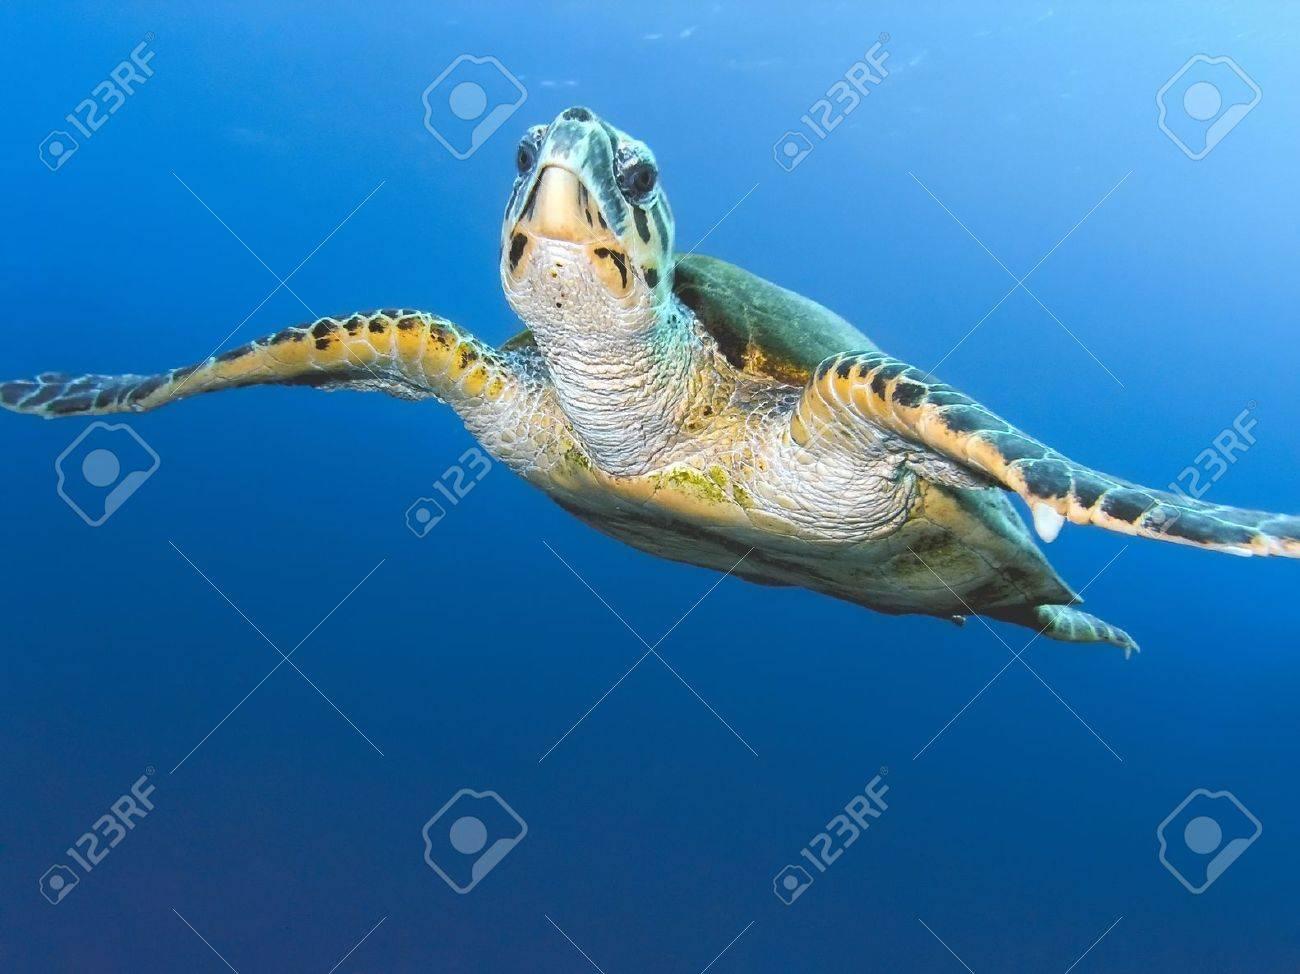 Sea turtle Stock Photo - 9448218